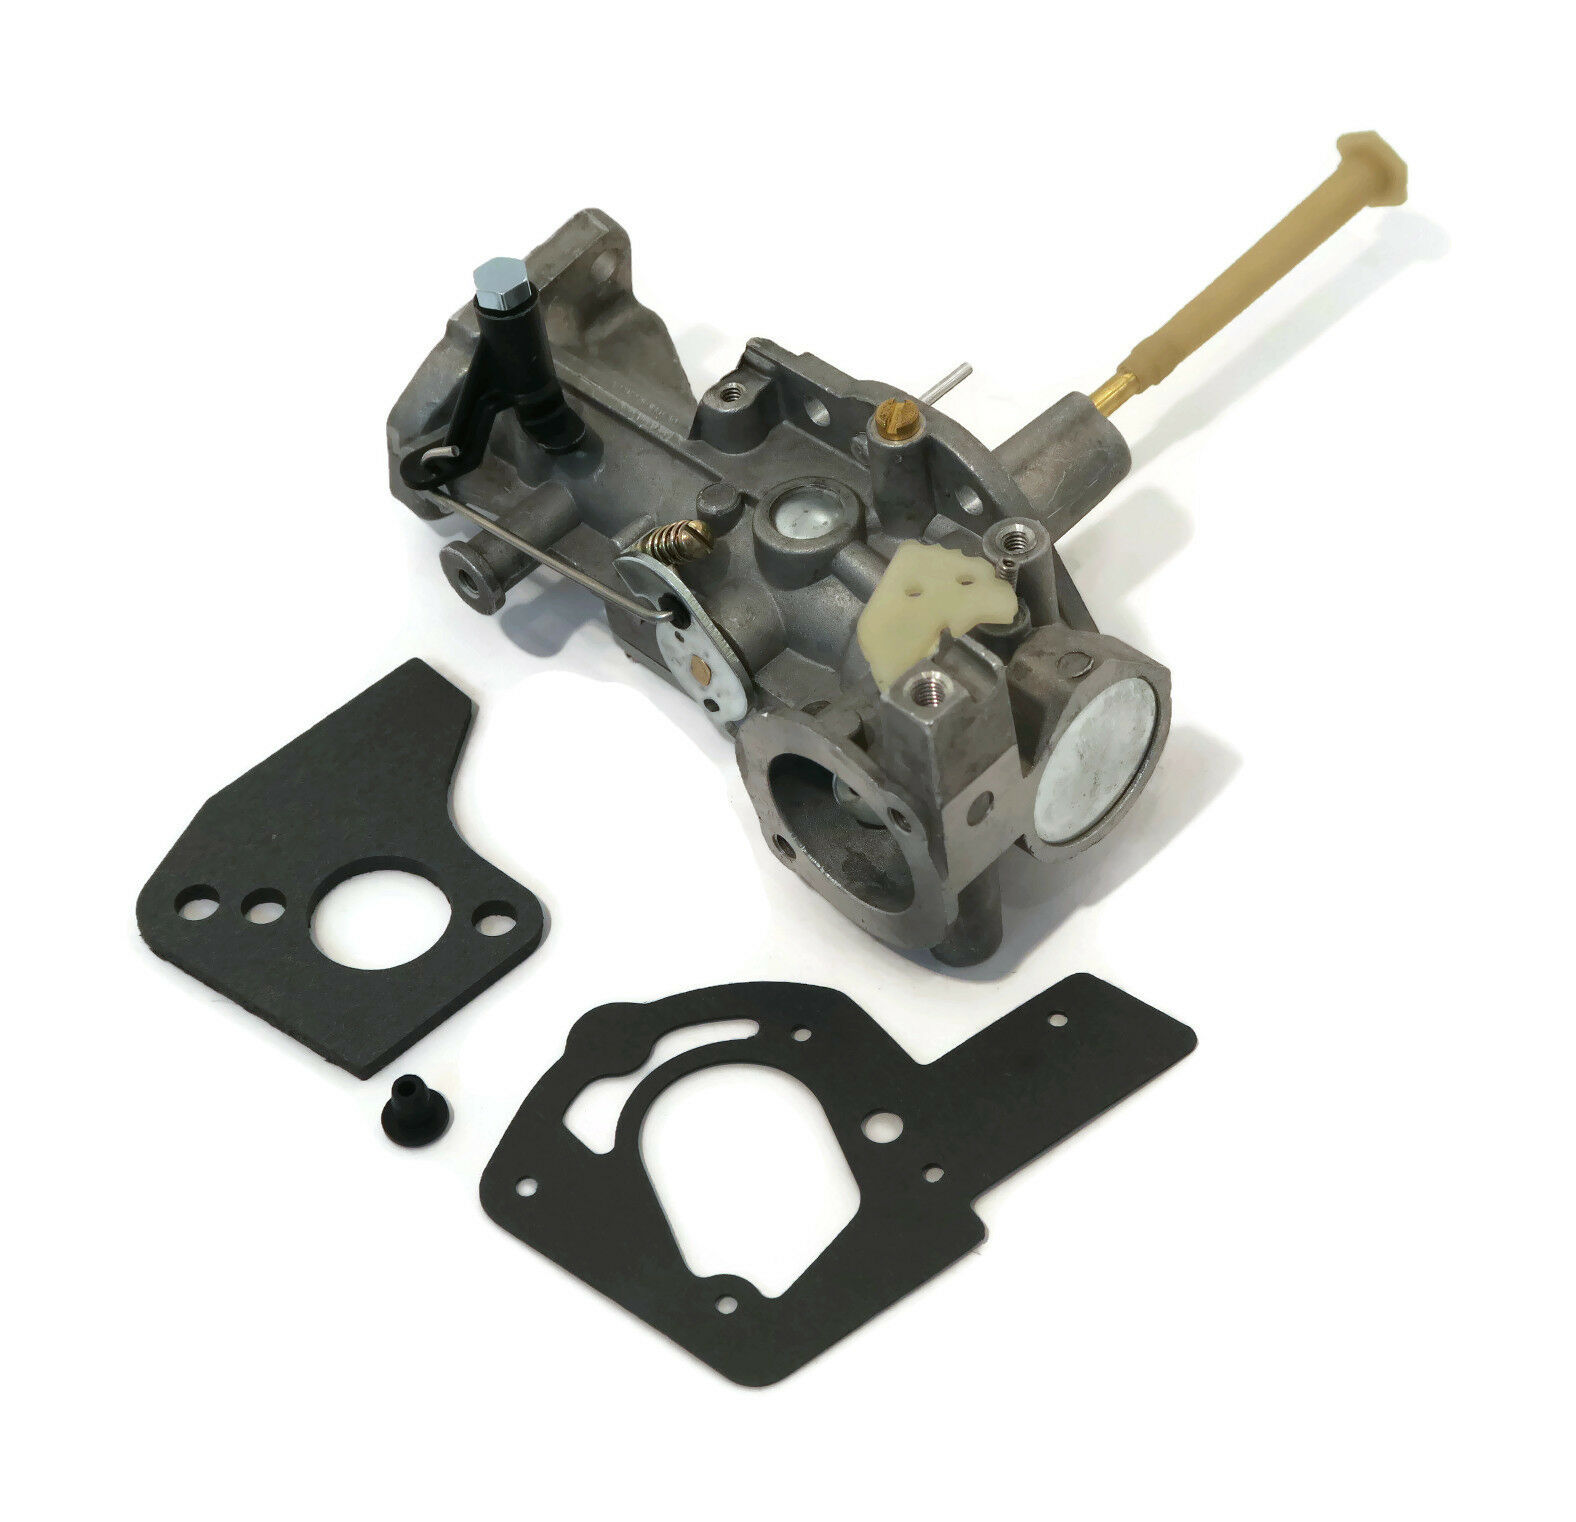 498298 Briggs/&Stratton Carburetor for 133217 133232 133237 133252 133292 Series